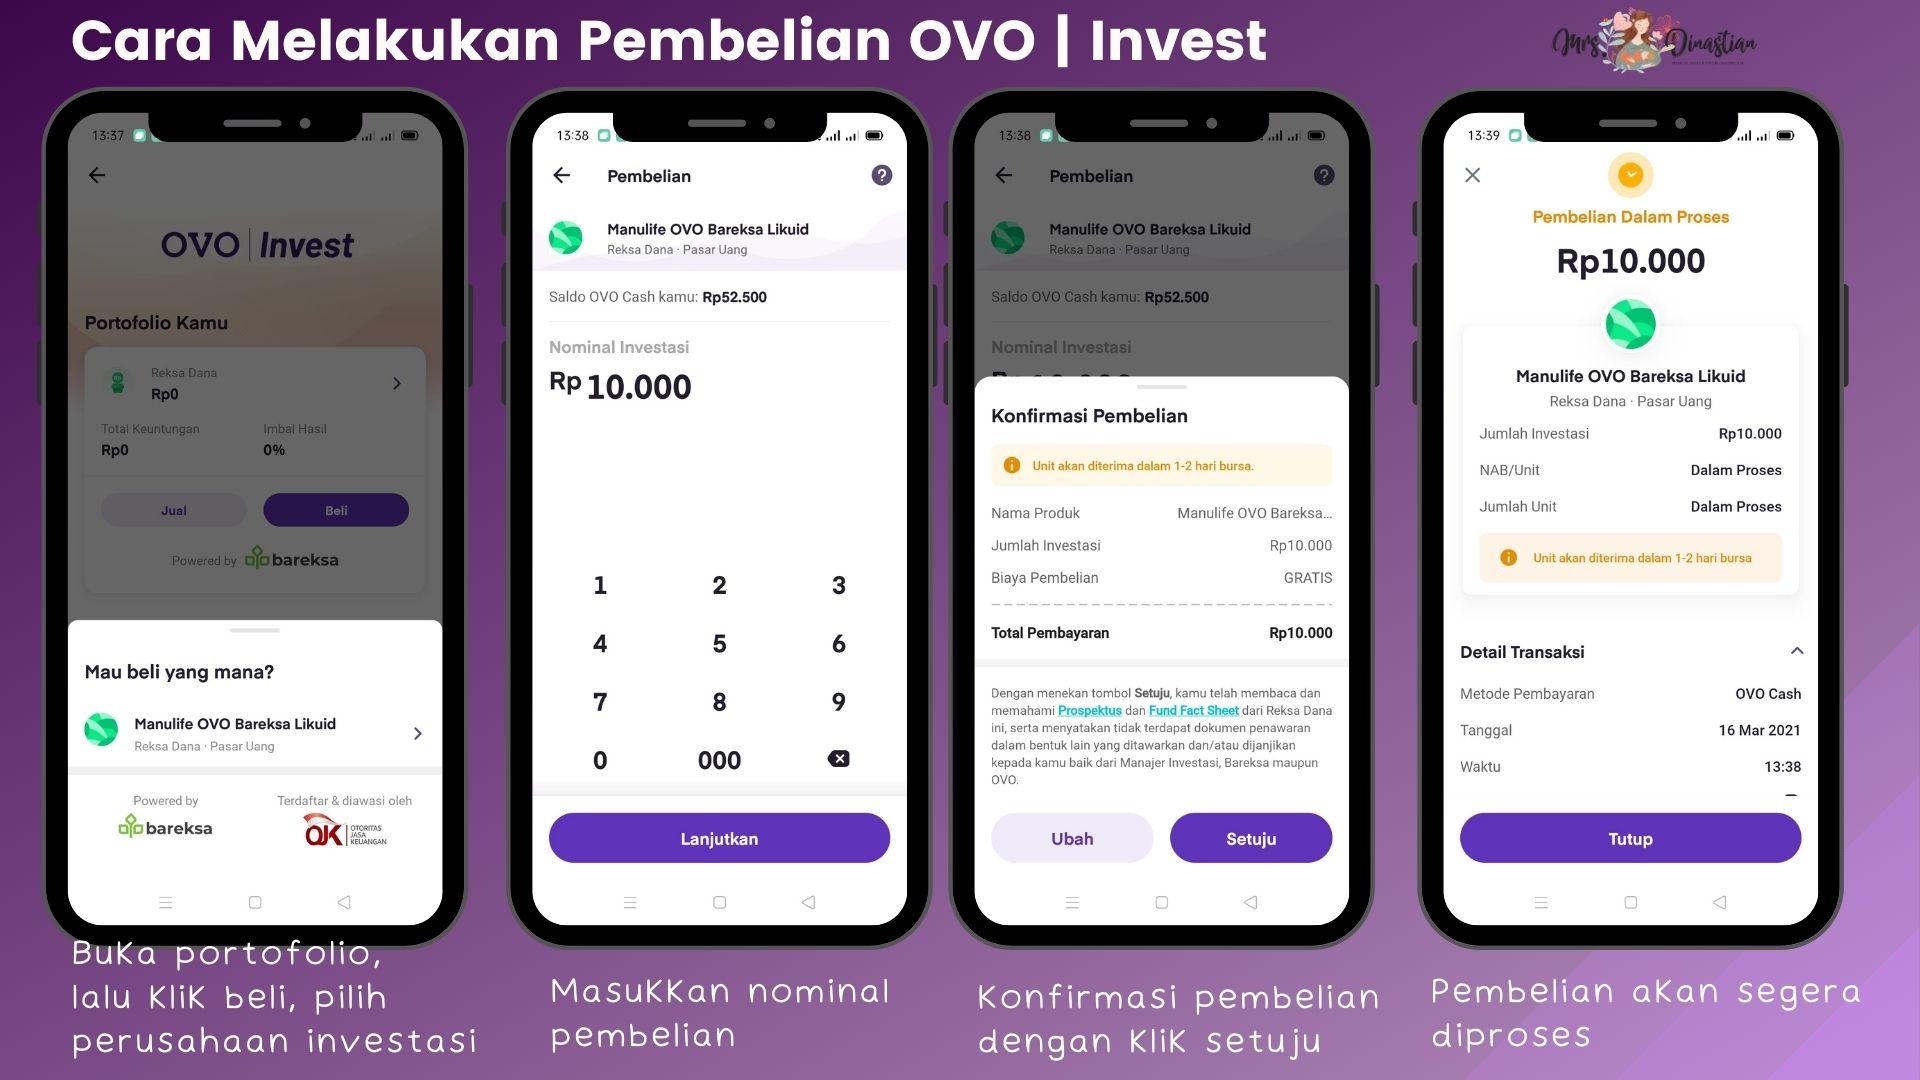 cara beli OVO | Invest